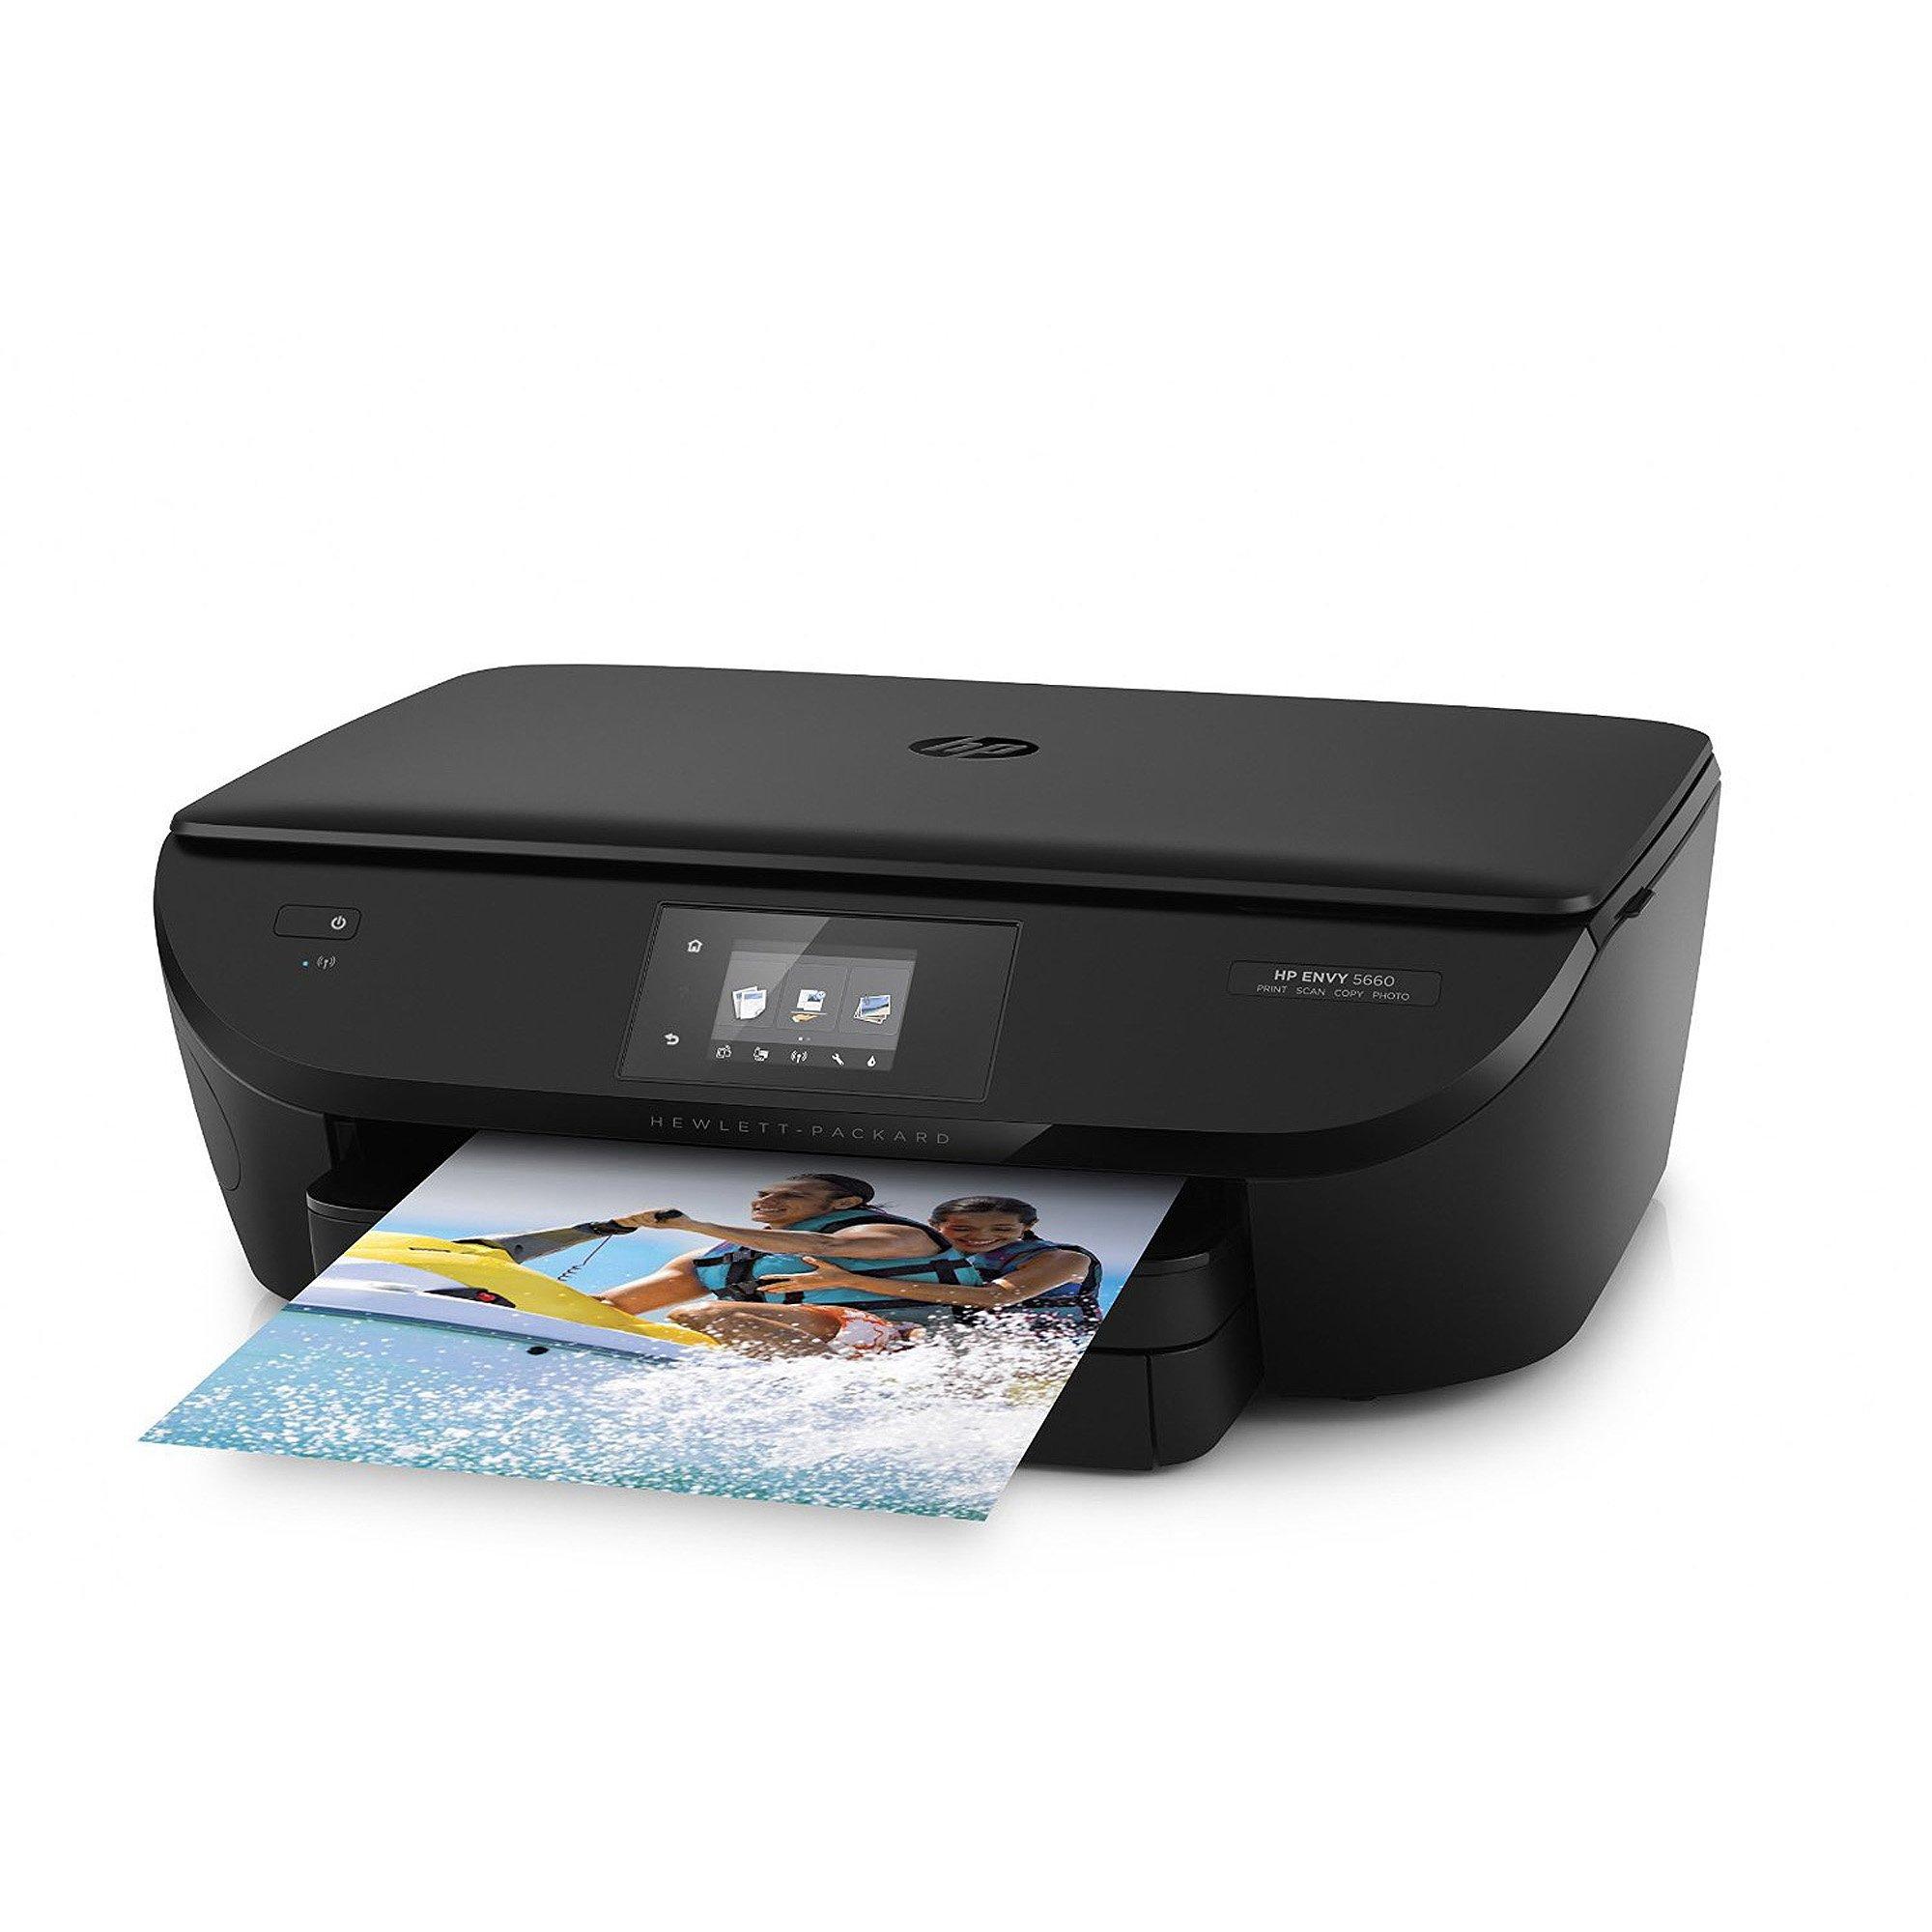 HP Envy 5660 e All in e Printer Copier Scanner